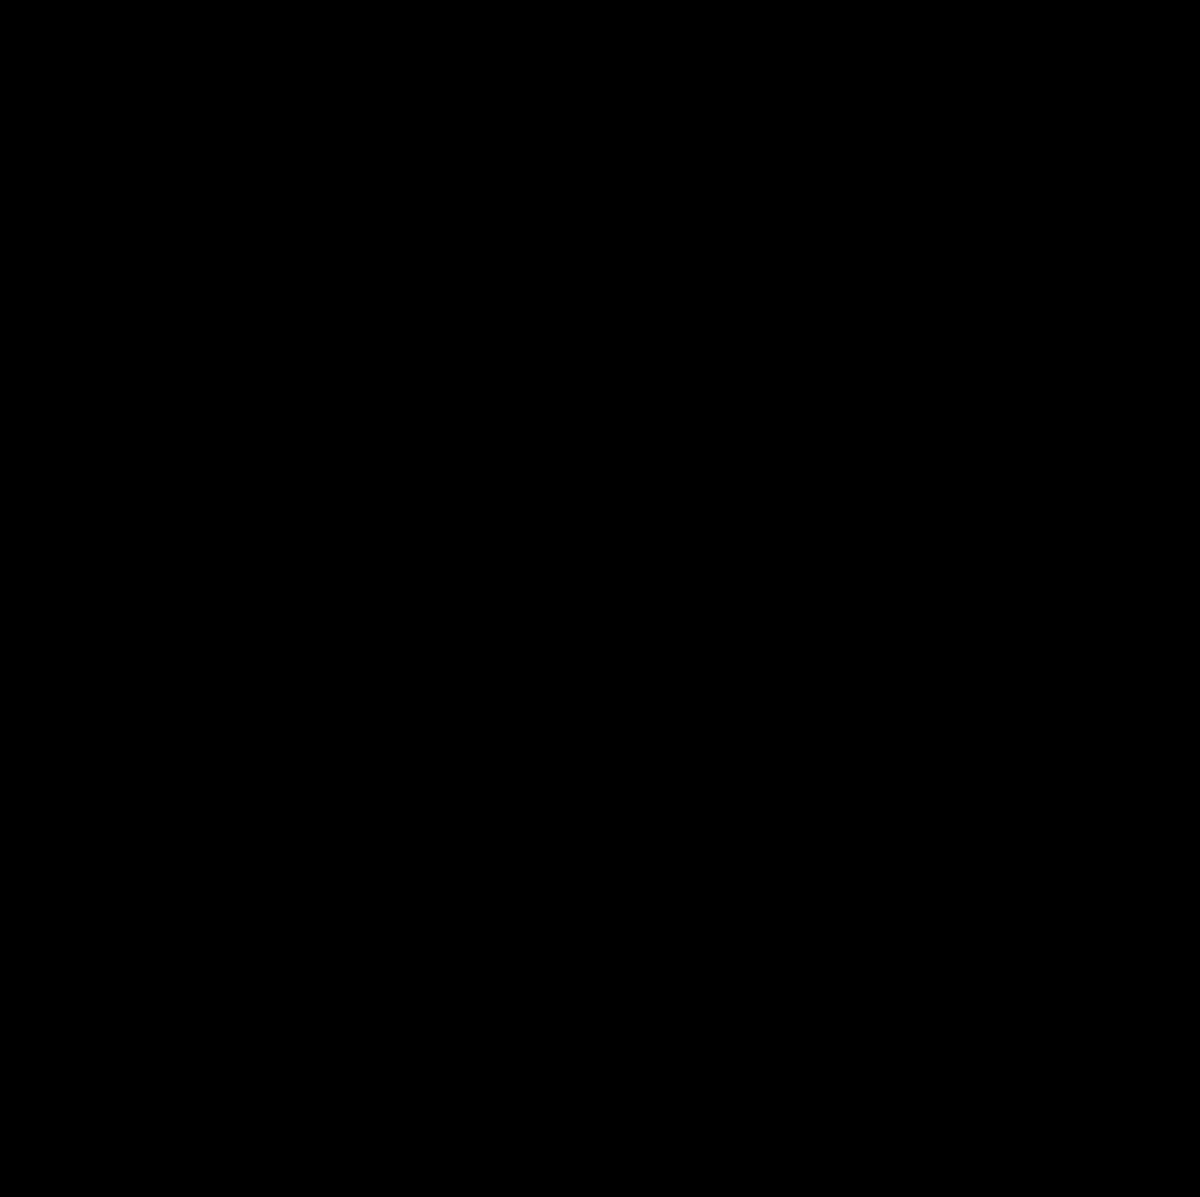 Urdu alphabet.